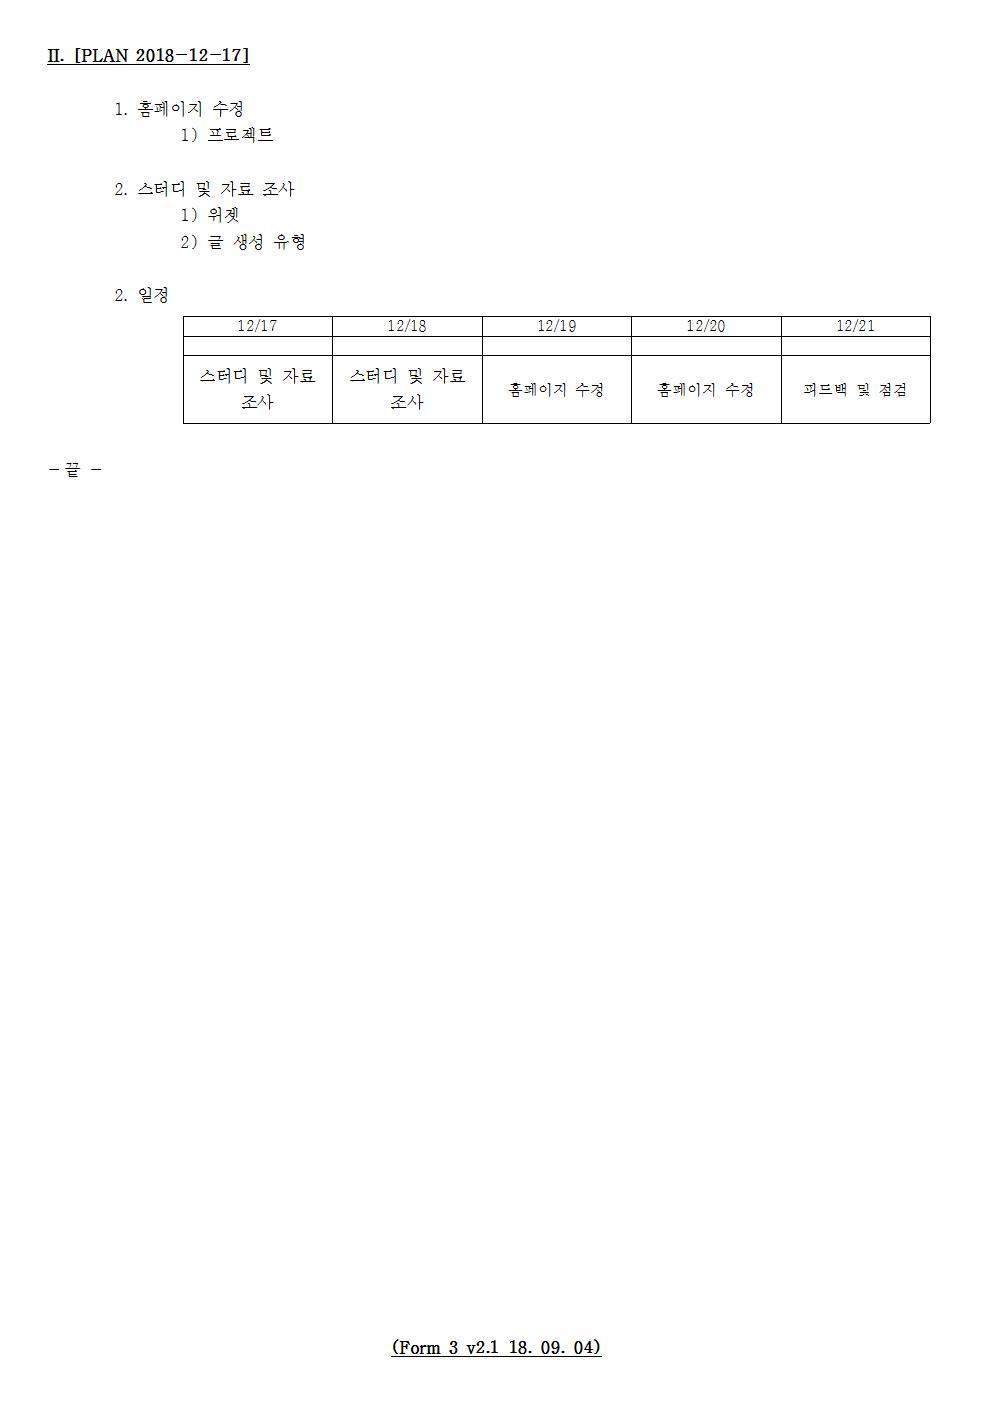 D-[18-047-BZ-07]-[BZEN HP v3.0]-[2018-12-17][HH]002.jpg